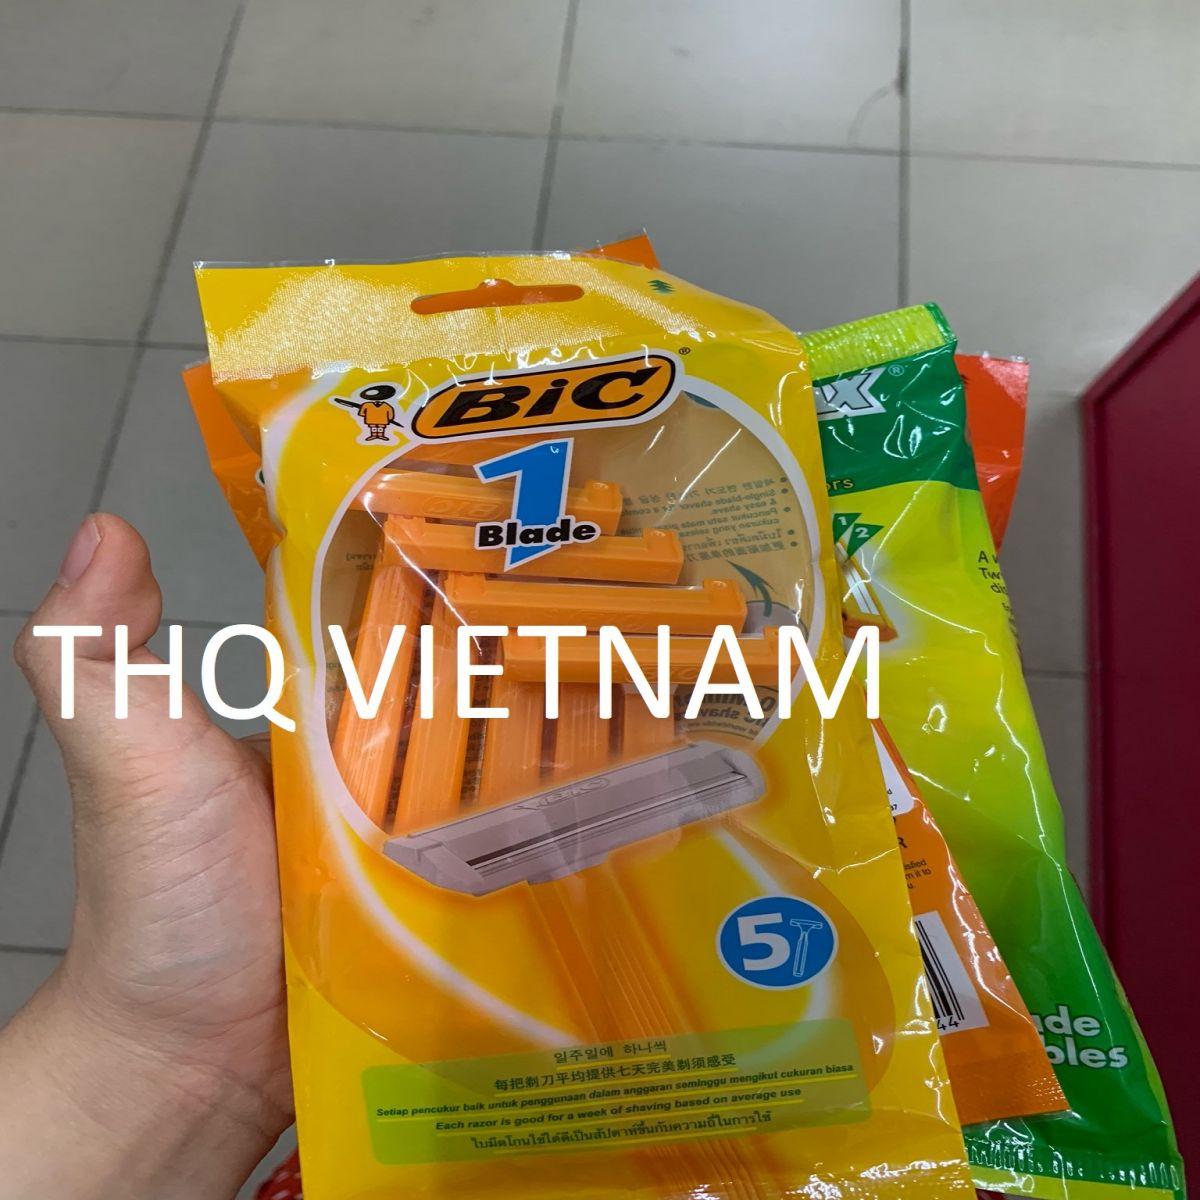 [THQ VIETNAM] BIC 1 blade razor x5